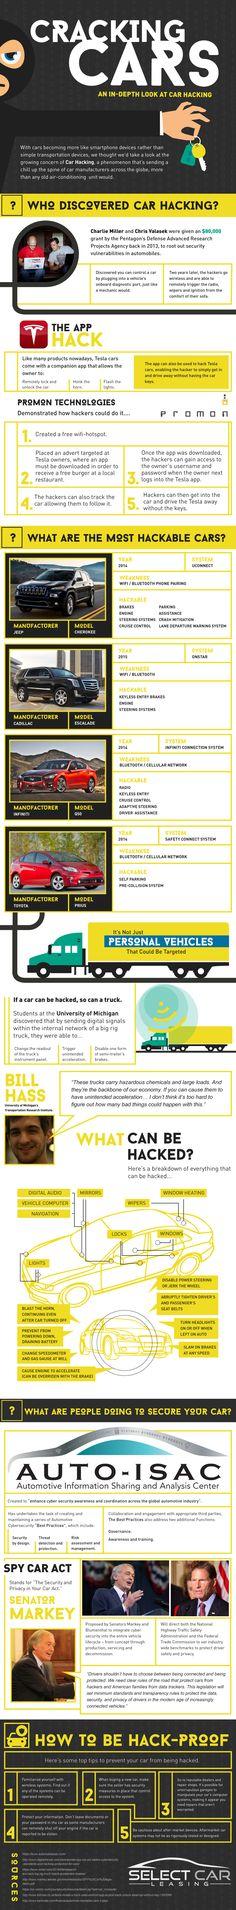 232 Best Transportation Infographics images in 2018